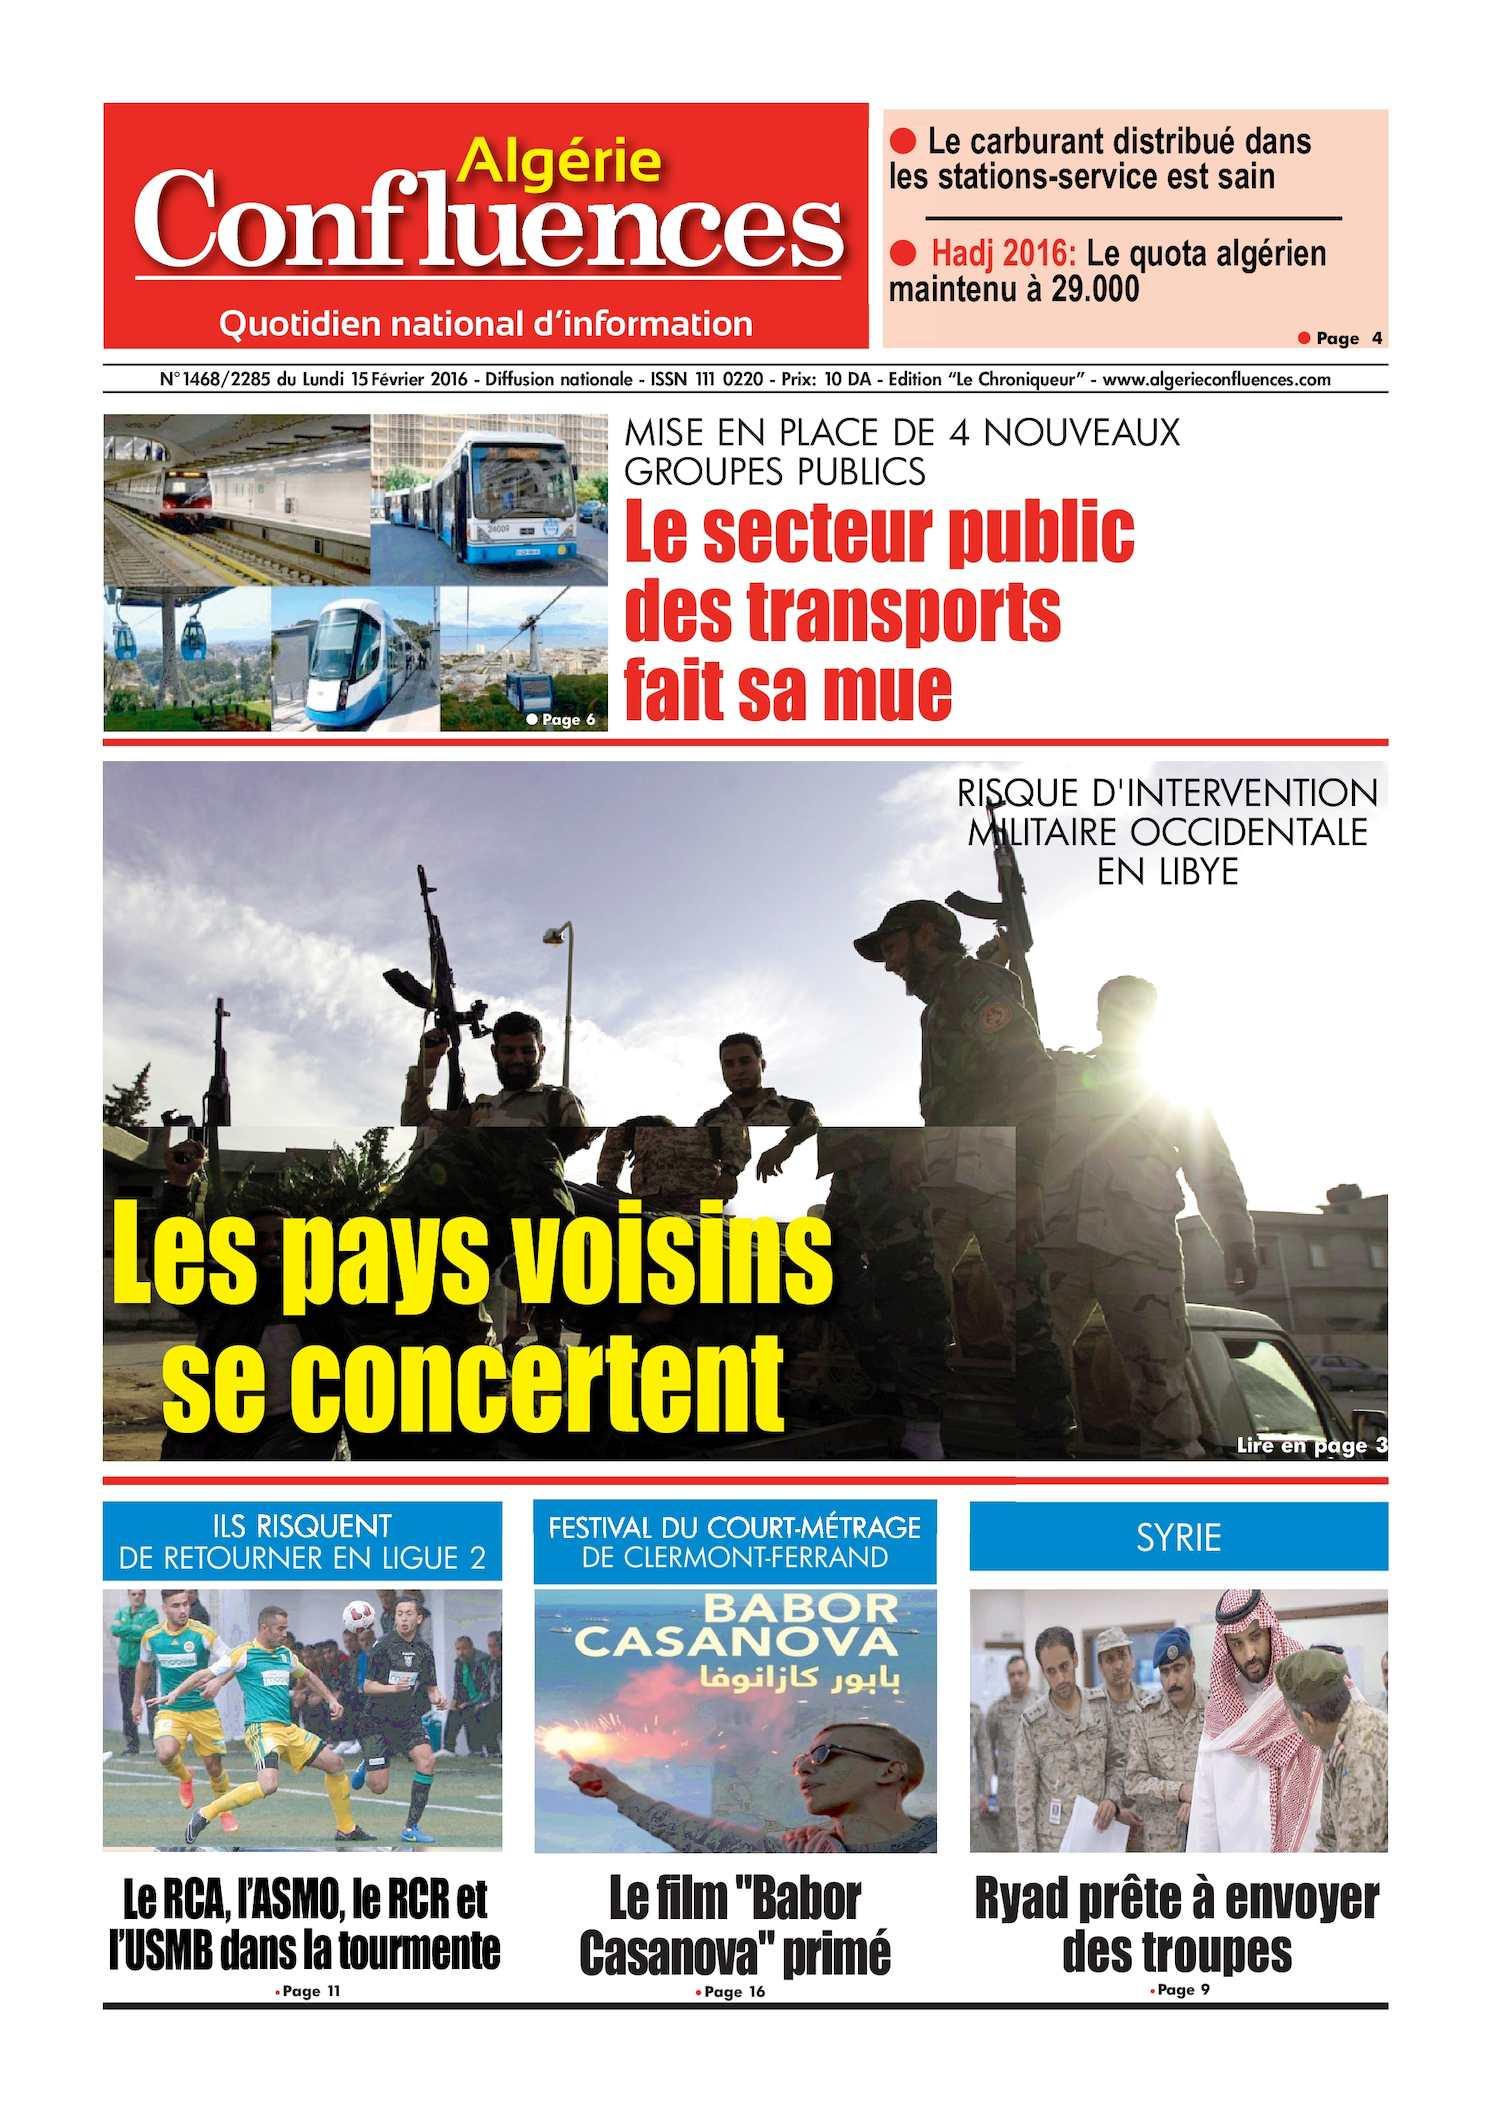 Calam o algerie confluences 15 fevrier 2016 - Service a the algerien ...